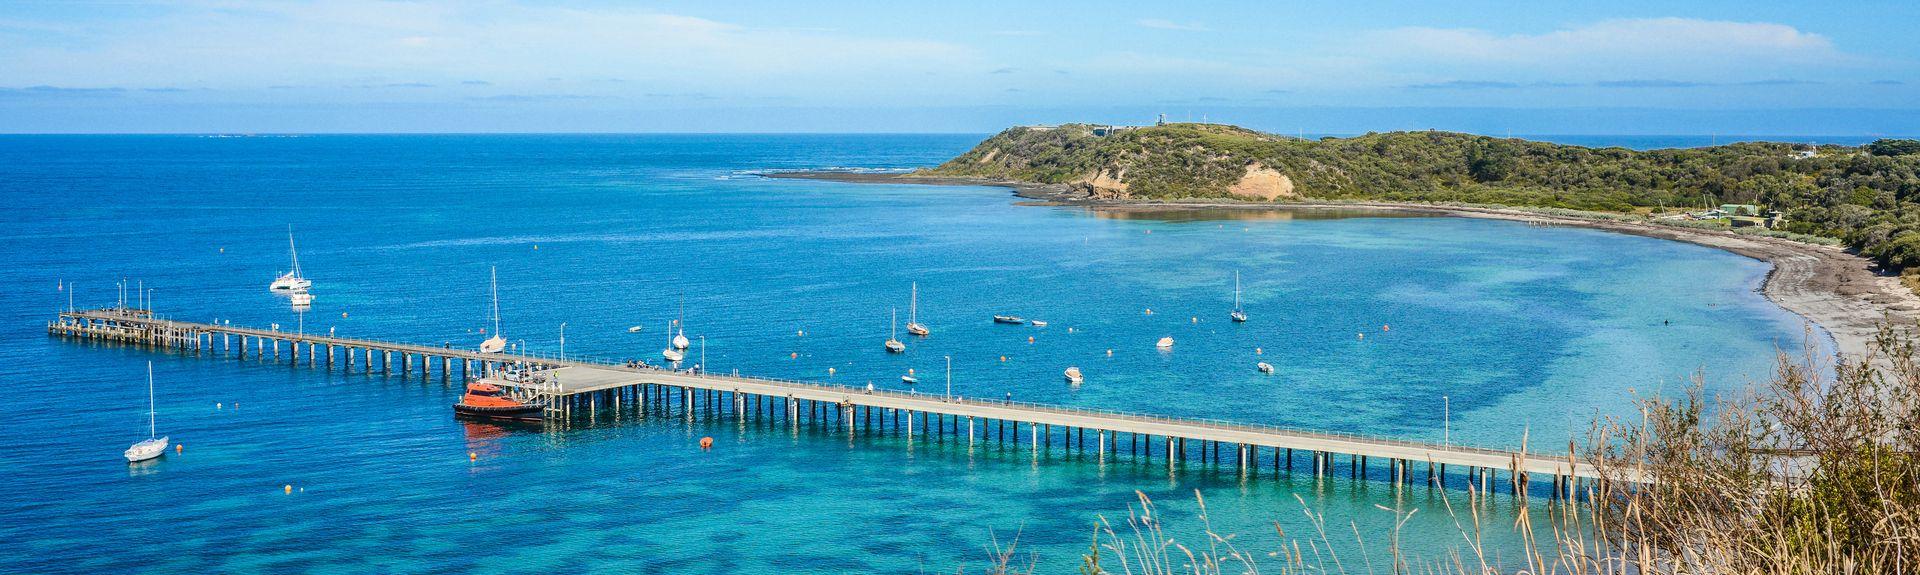 Flinders, Victoria, Australia